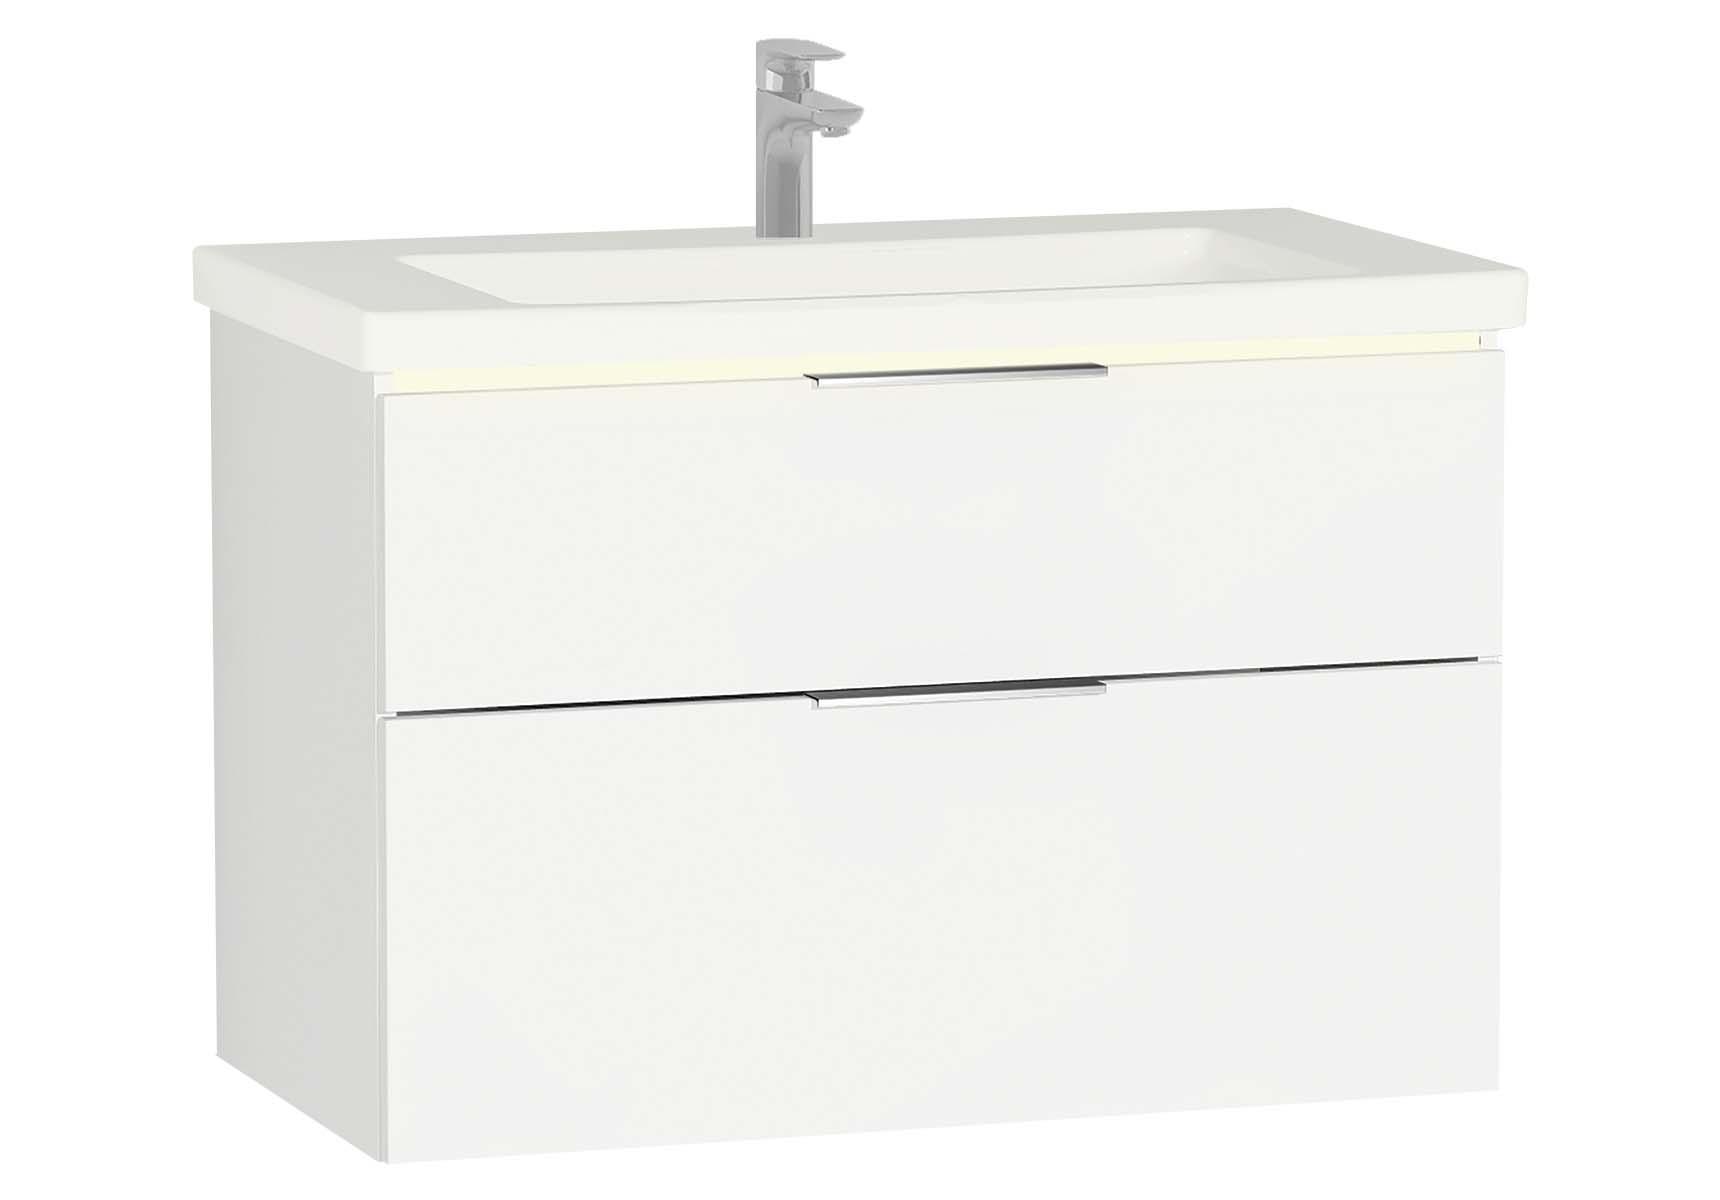 Central Washbasin Unit with 2 drawers, 90 cm, White High Gloss, Ceramic Washbasin, Led